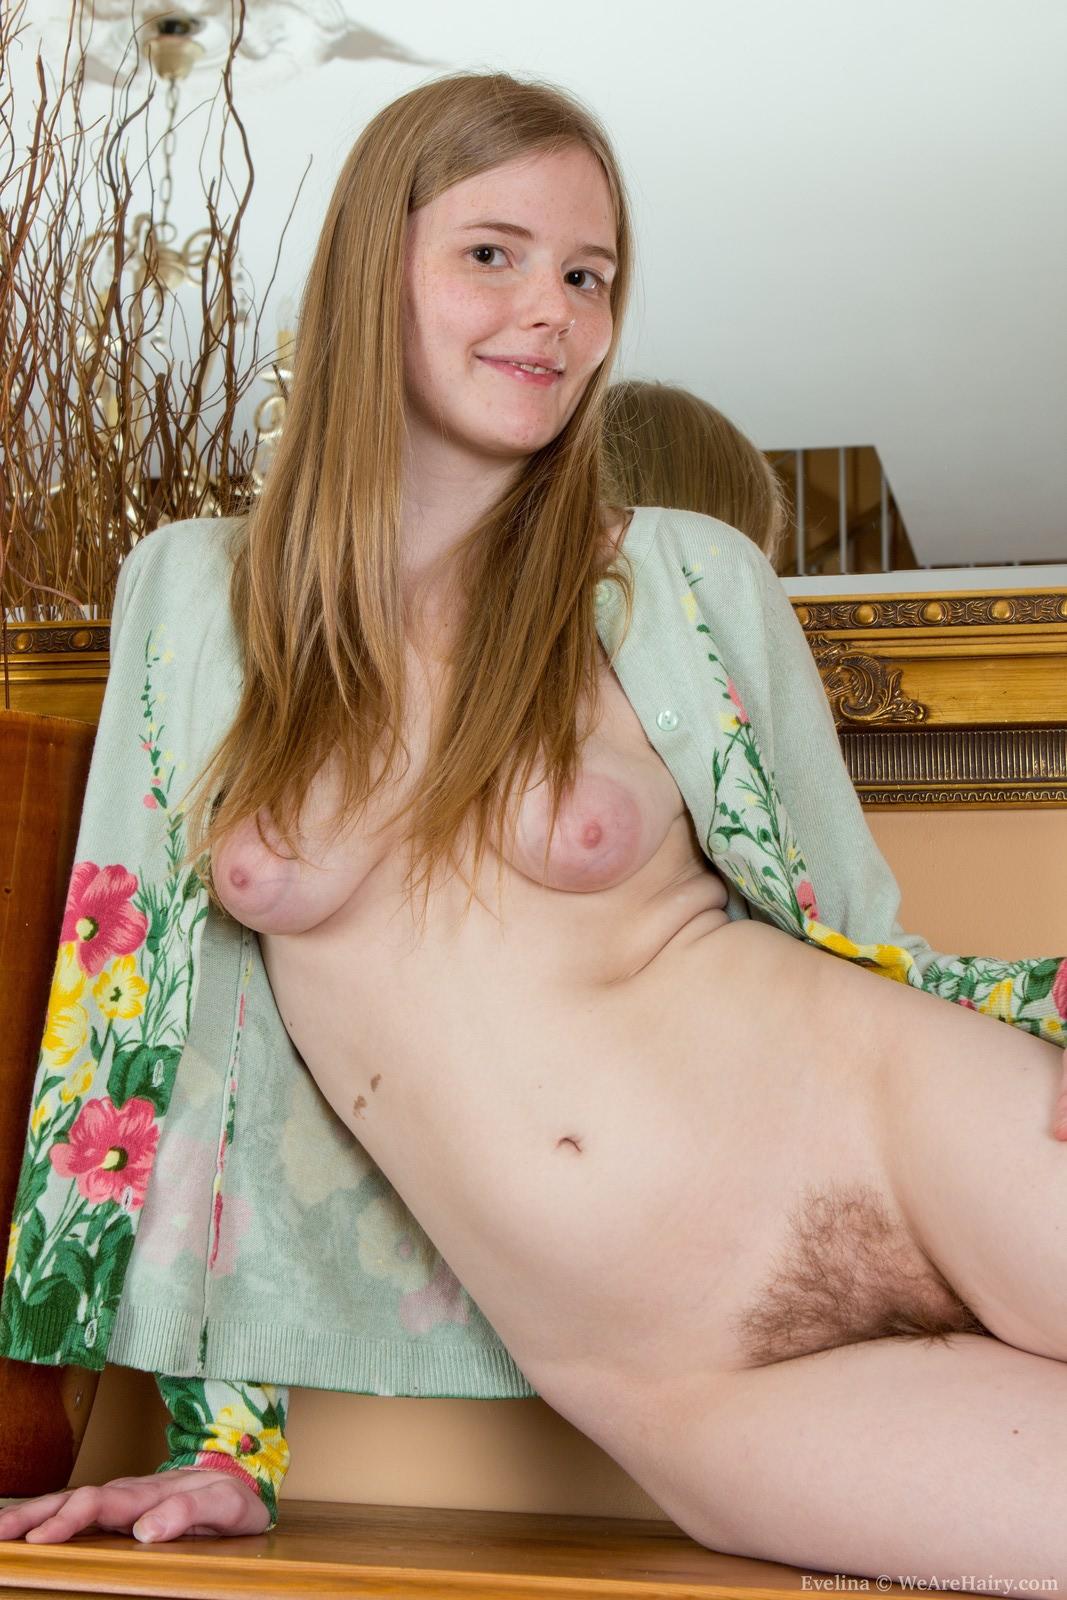 Hot youmg girls nude